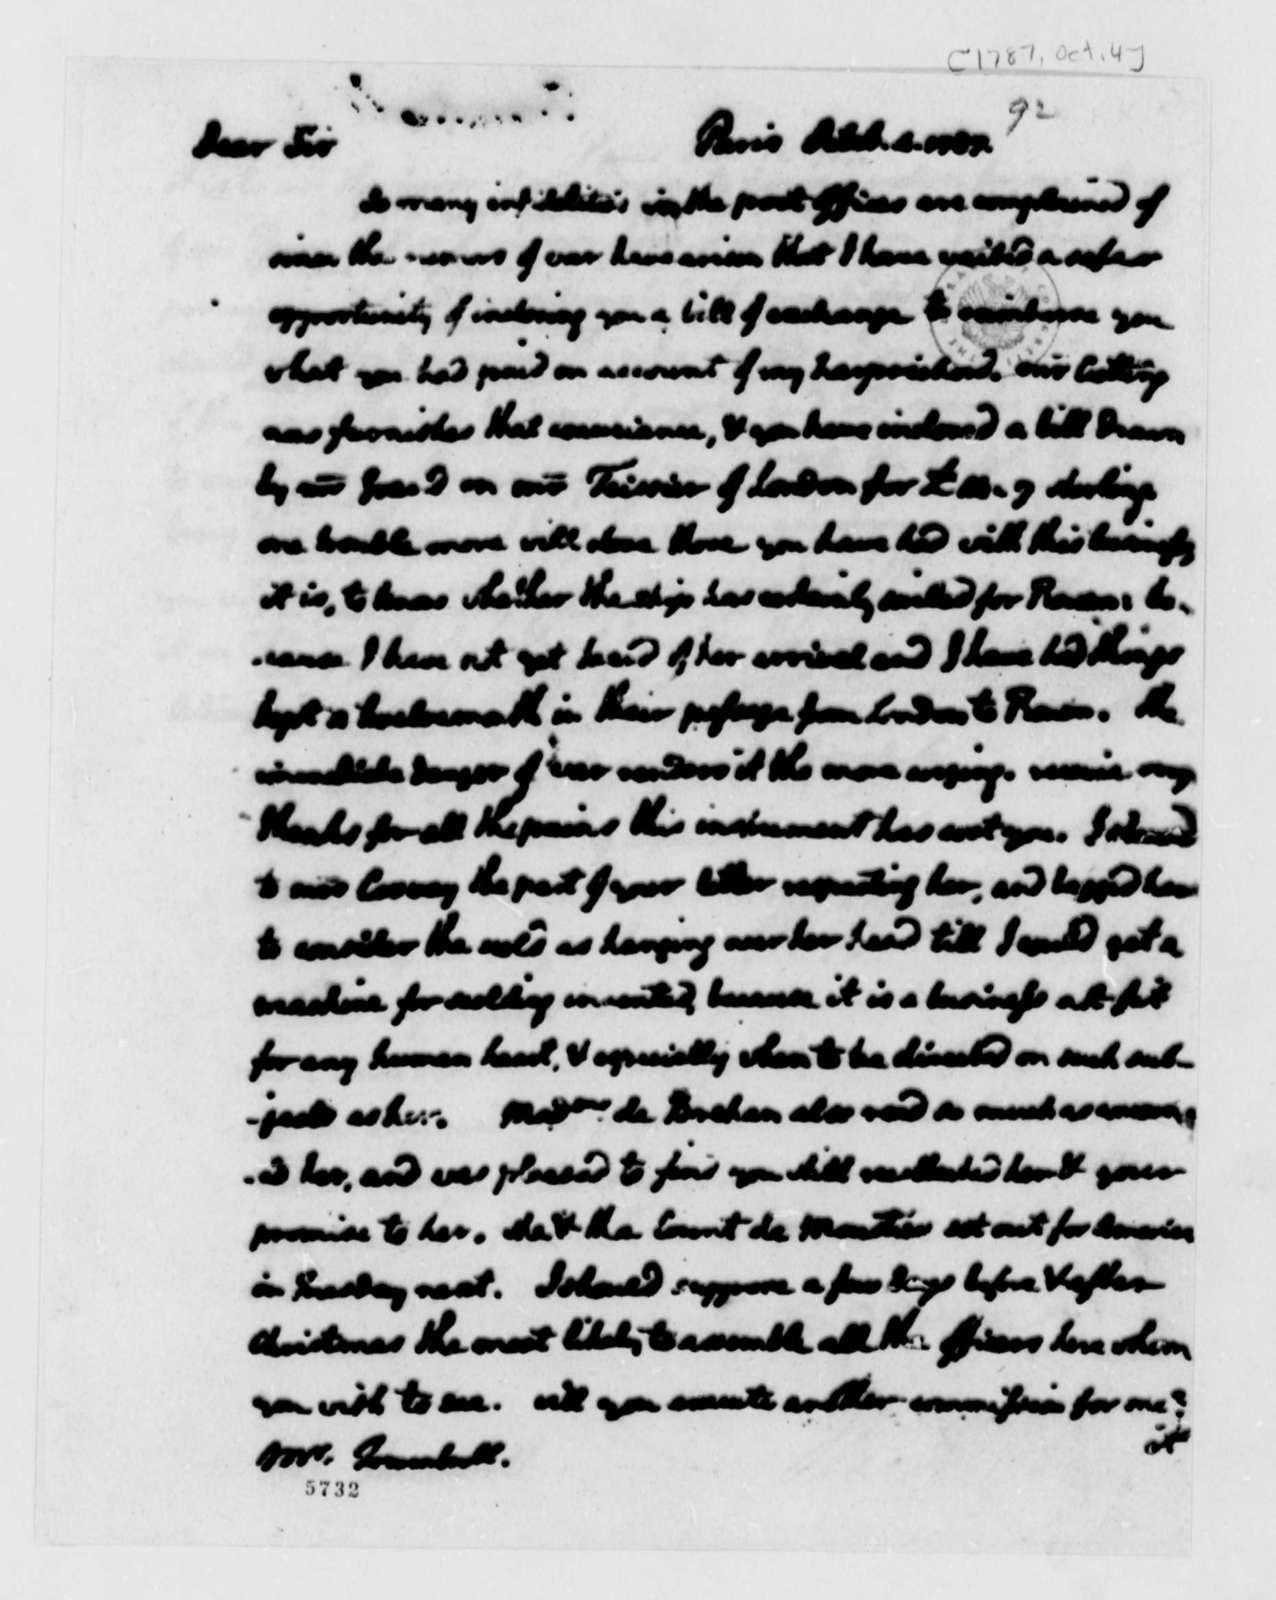 Thomas Jefferson to John Trumbull, October 4, 1787